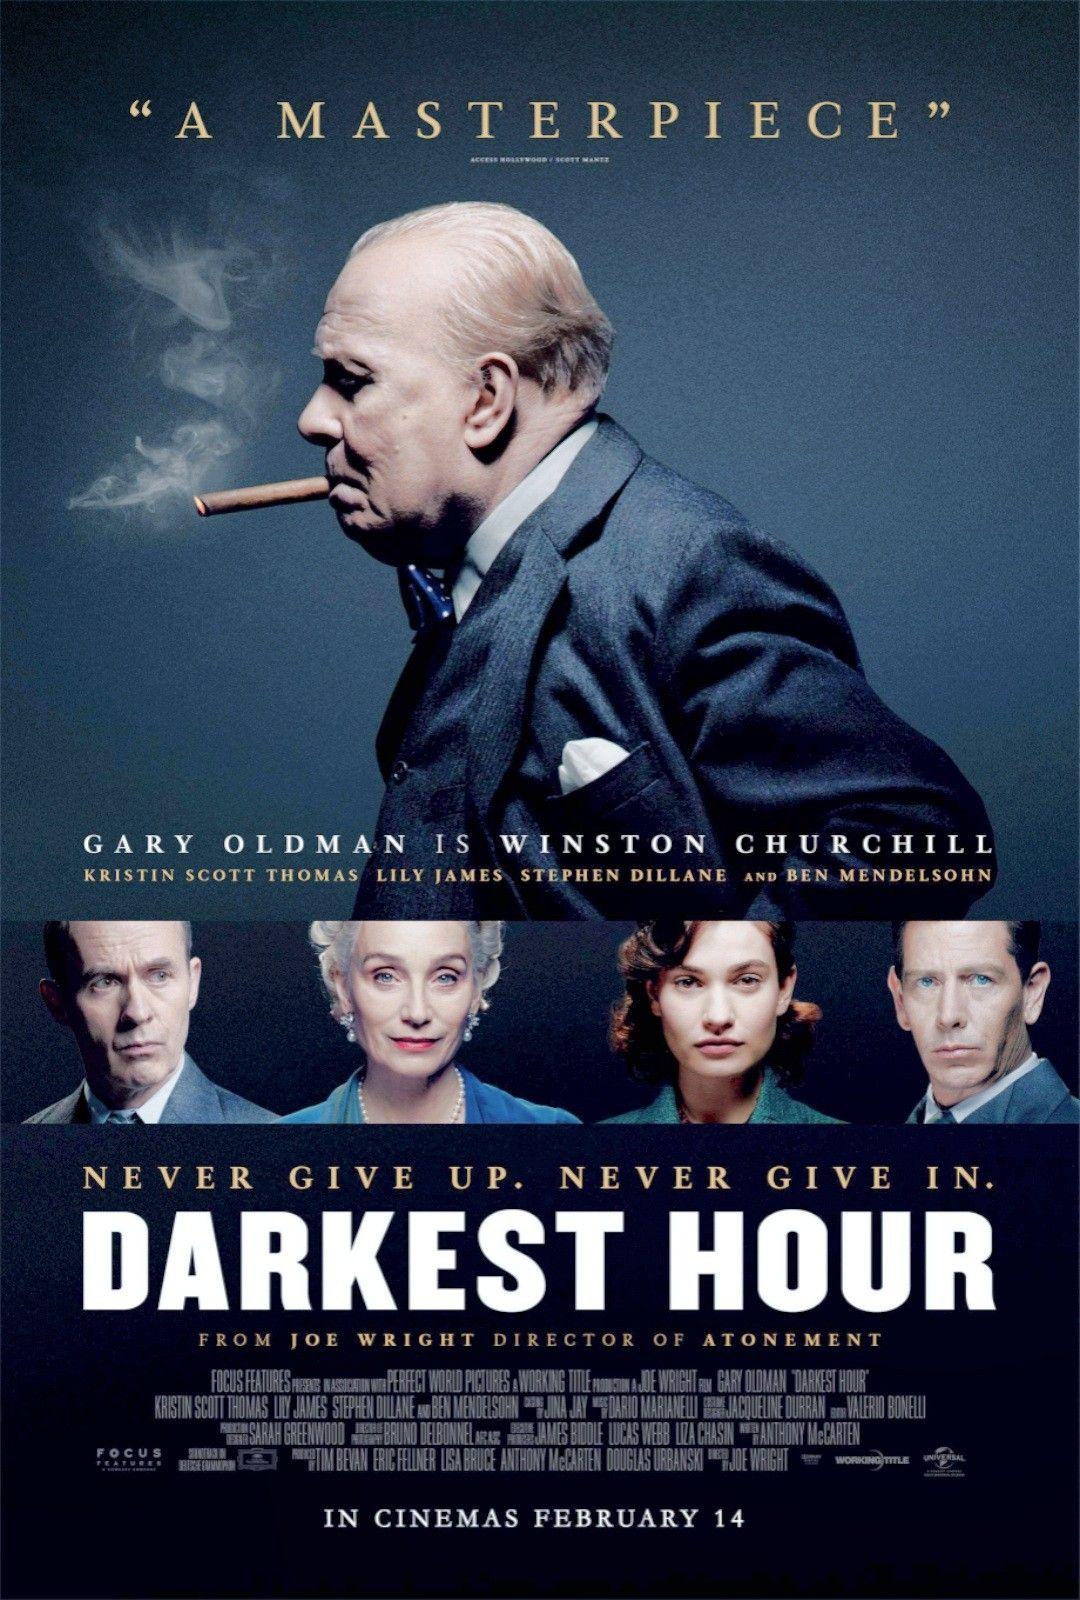 Darkest Hour (2017) ชั่วโมงพลิกโลก [ซับไทย]